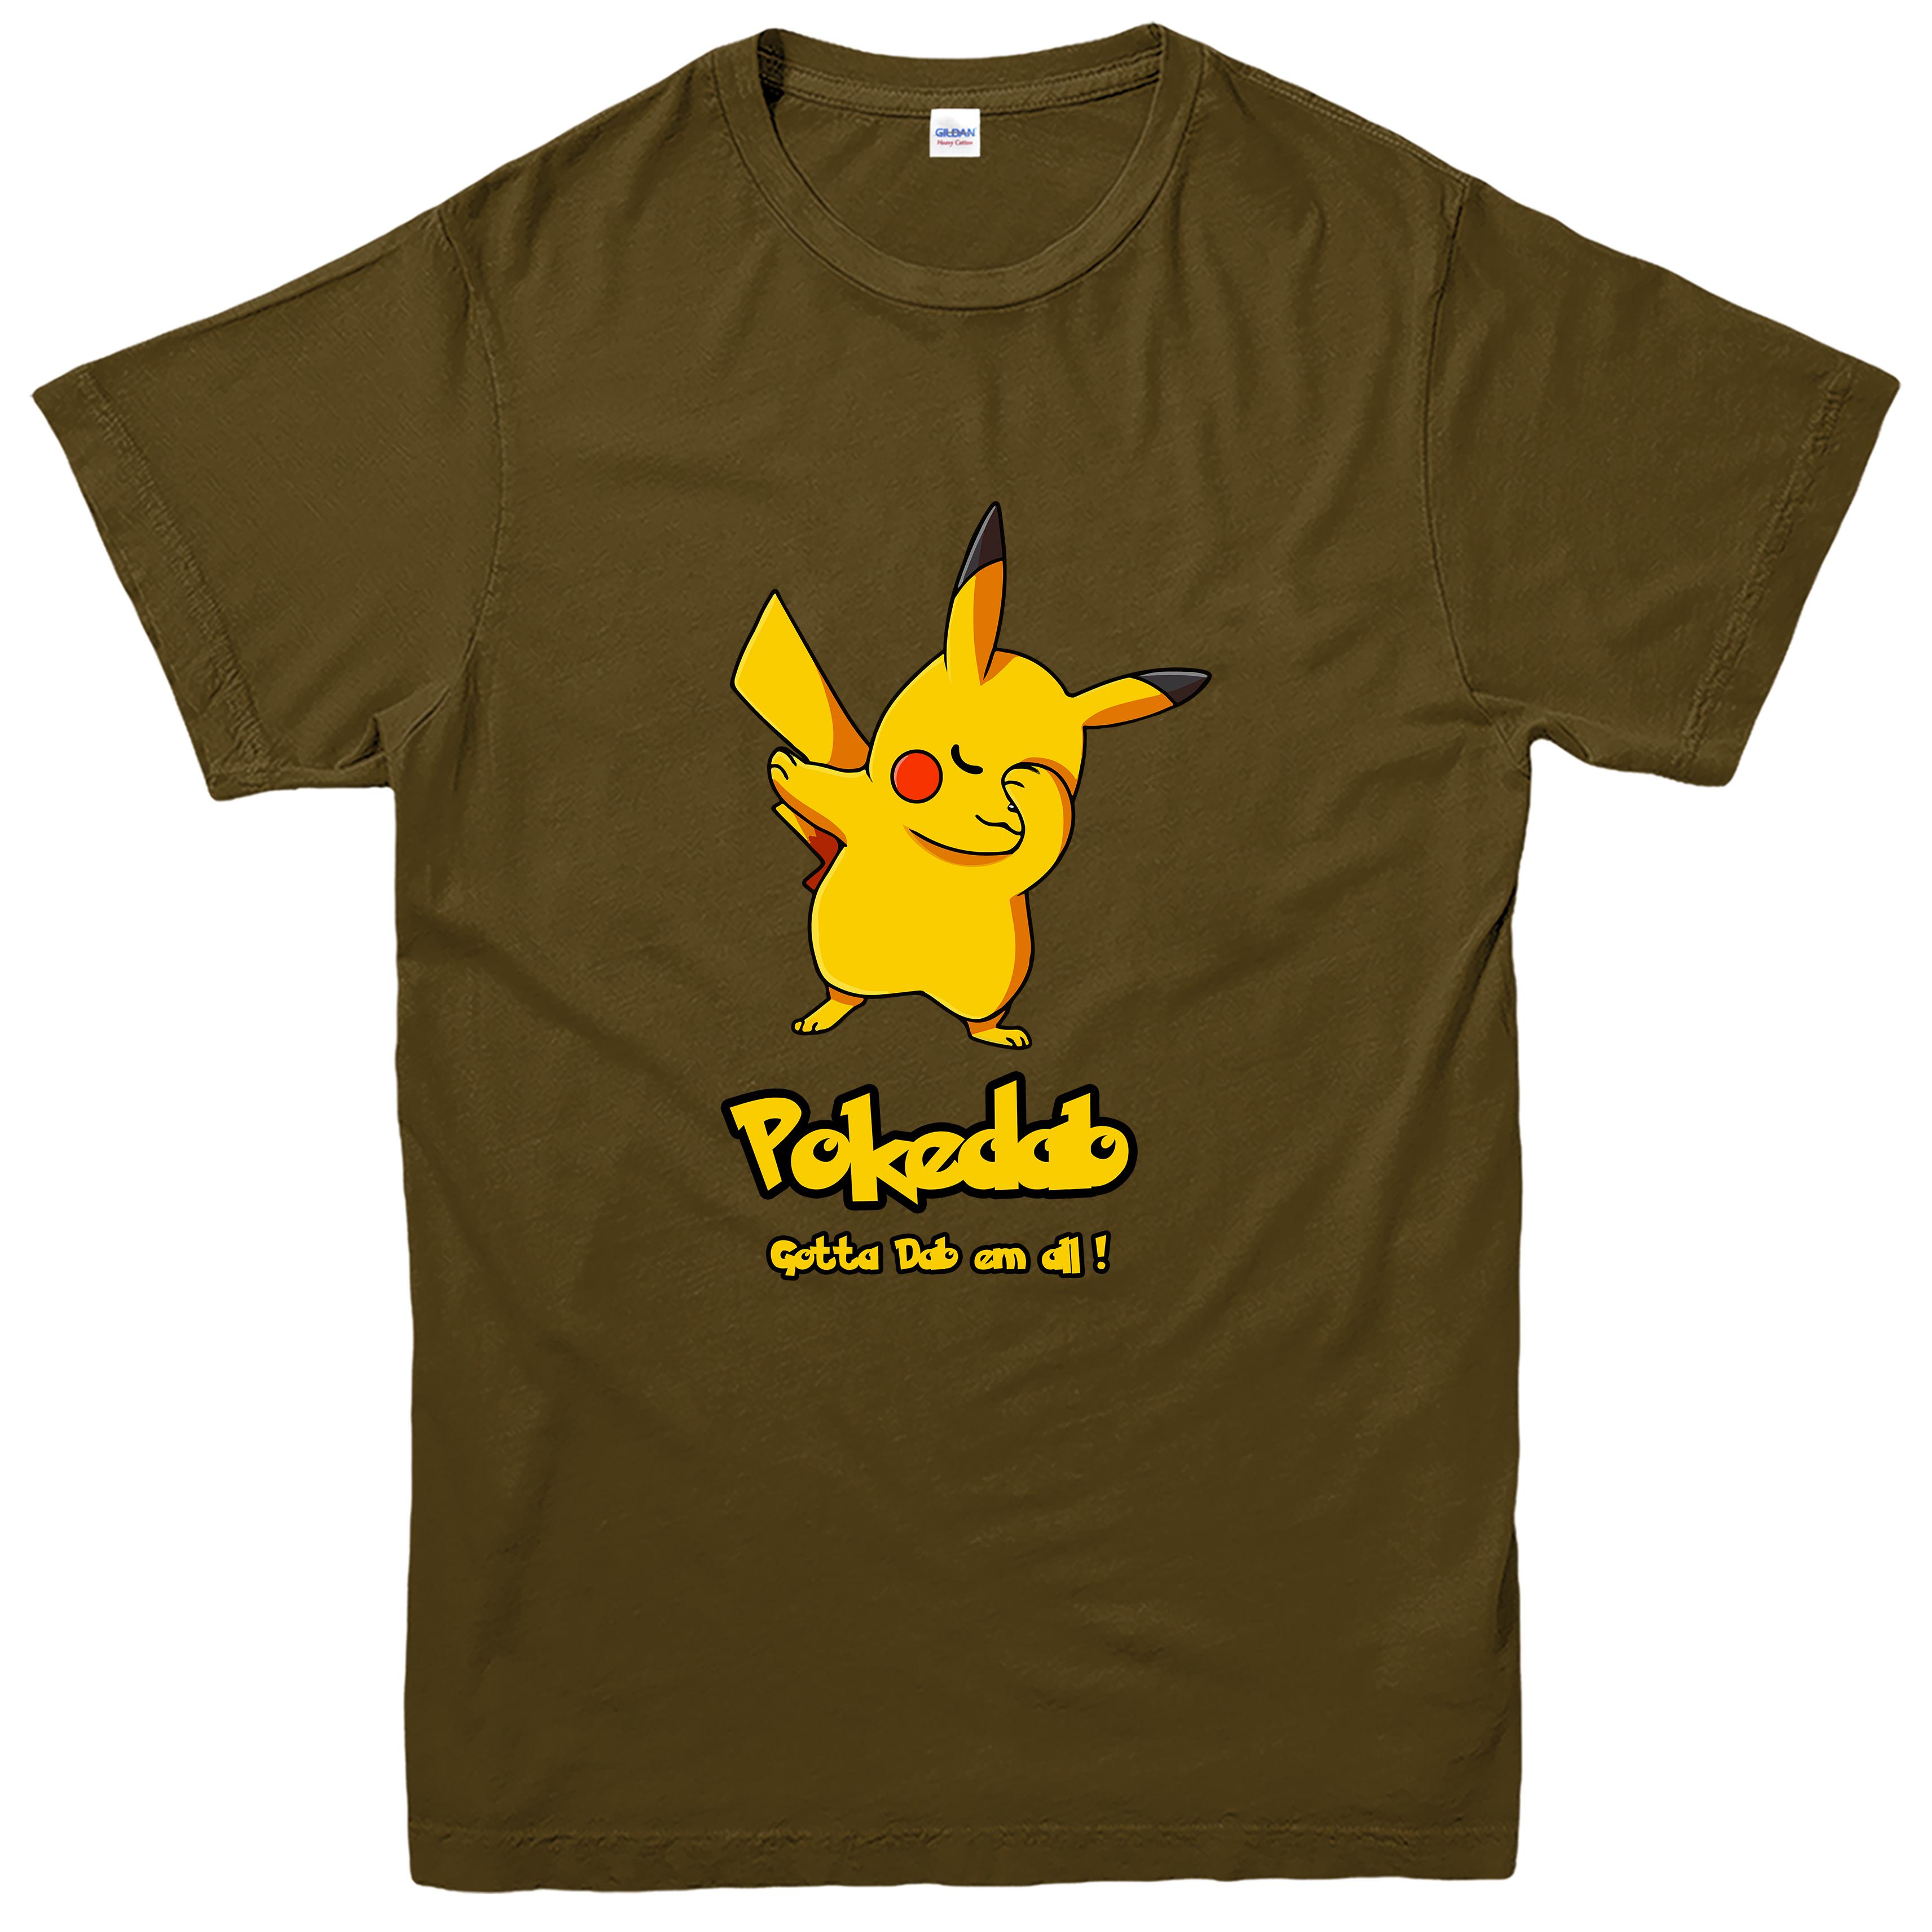 Top Pokedab T-shirt, Pikachu Pokemon Dab em all Spoof Tee Top | eBay DZ76